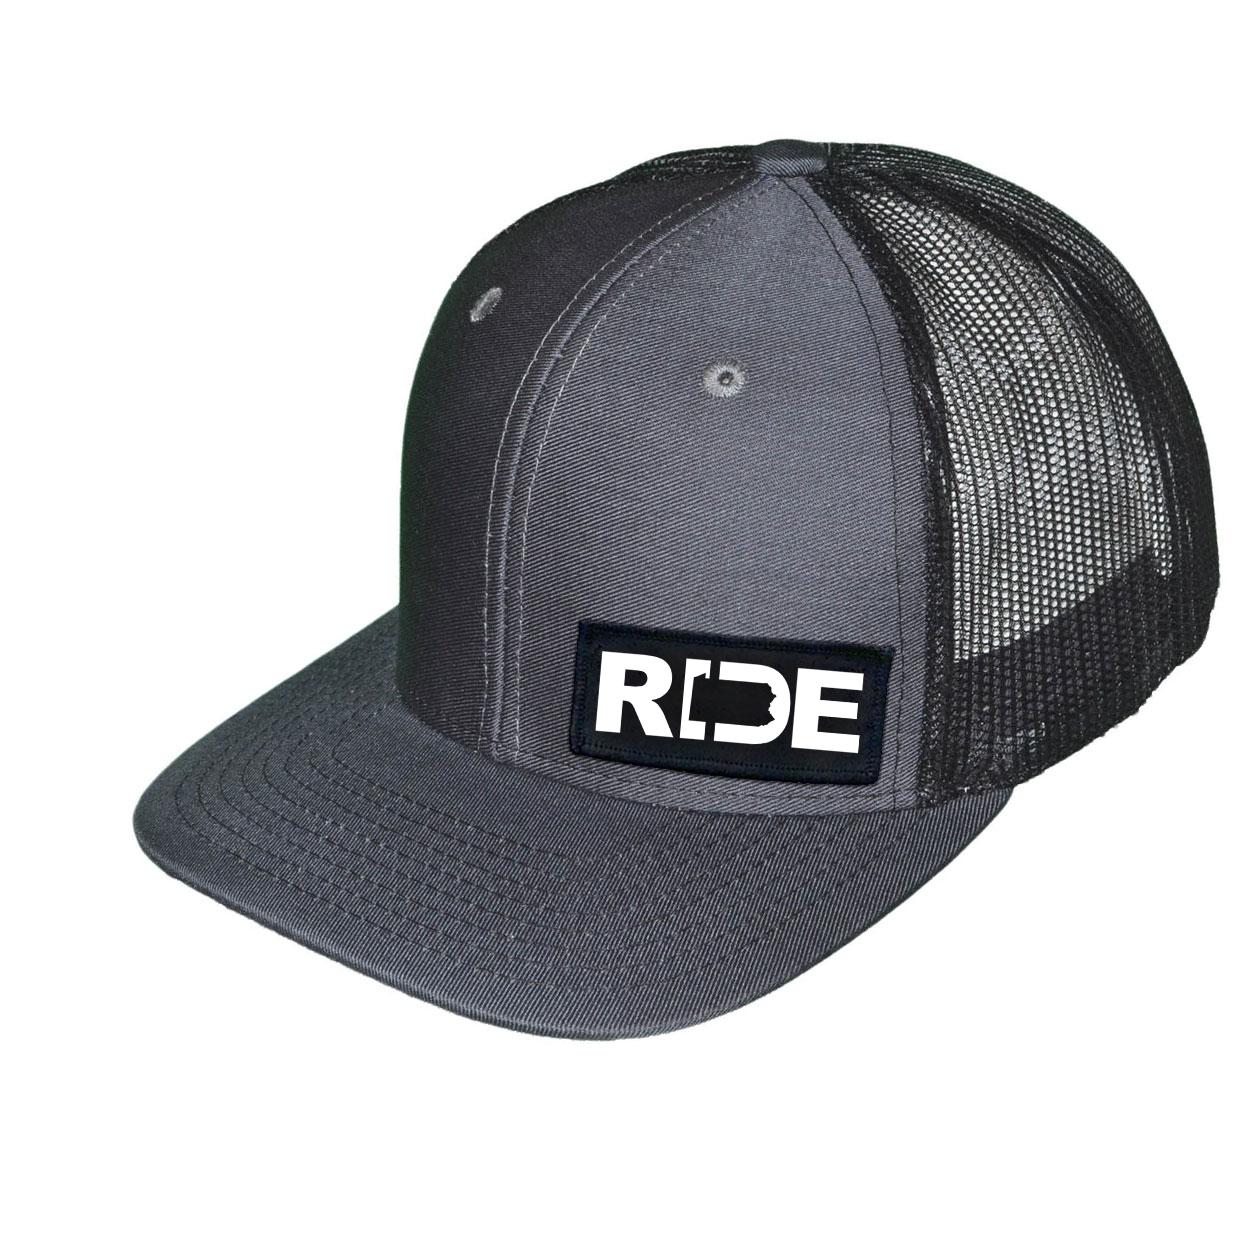 Ride Pennsylvania Night Out Woven Patch Snapback Trucker Hat Dark Gray/Black (White Logo)